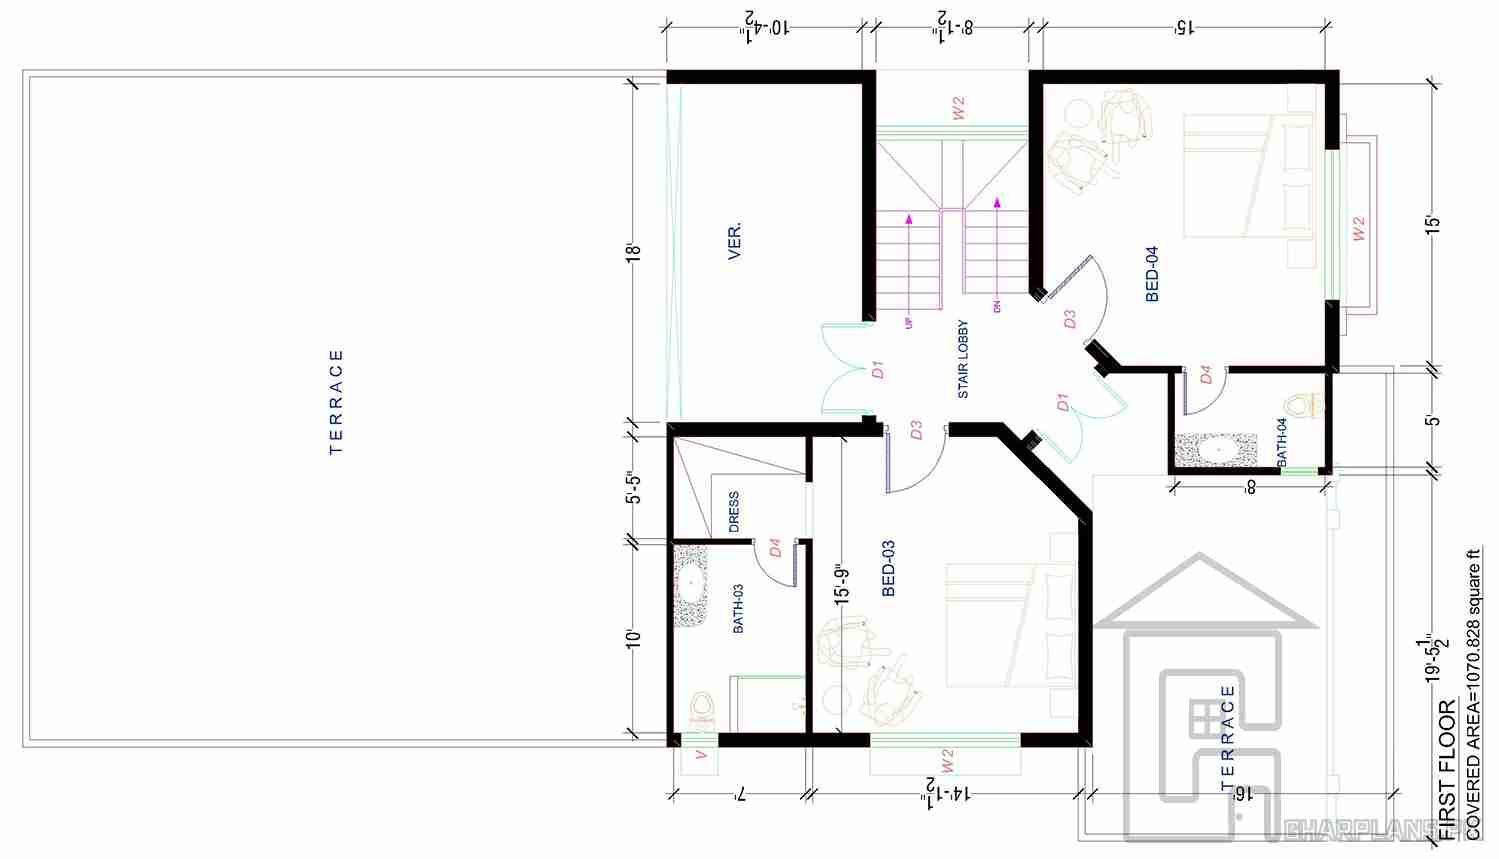 Wunderbar Www Home Map Ideen - Schaltplan Serie Circuit Collection ...